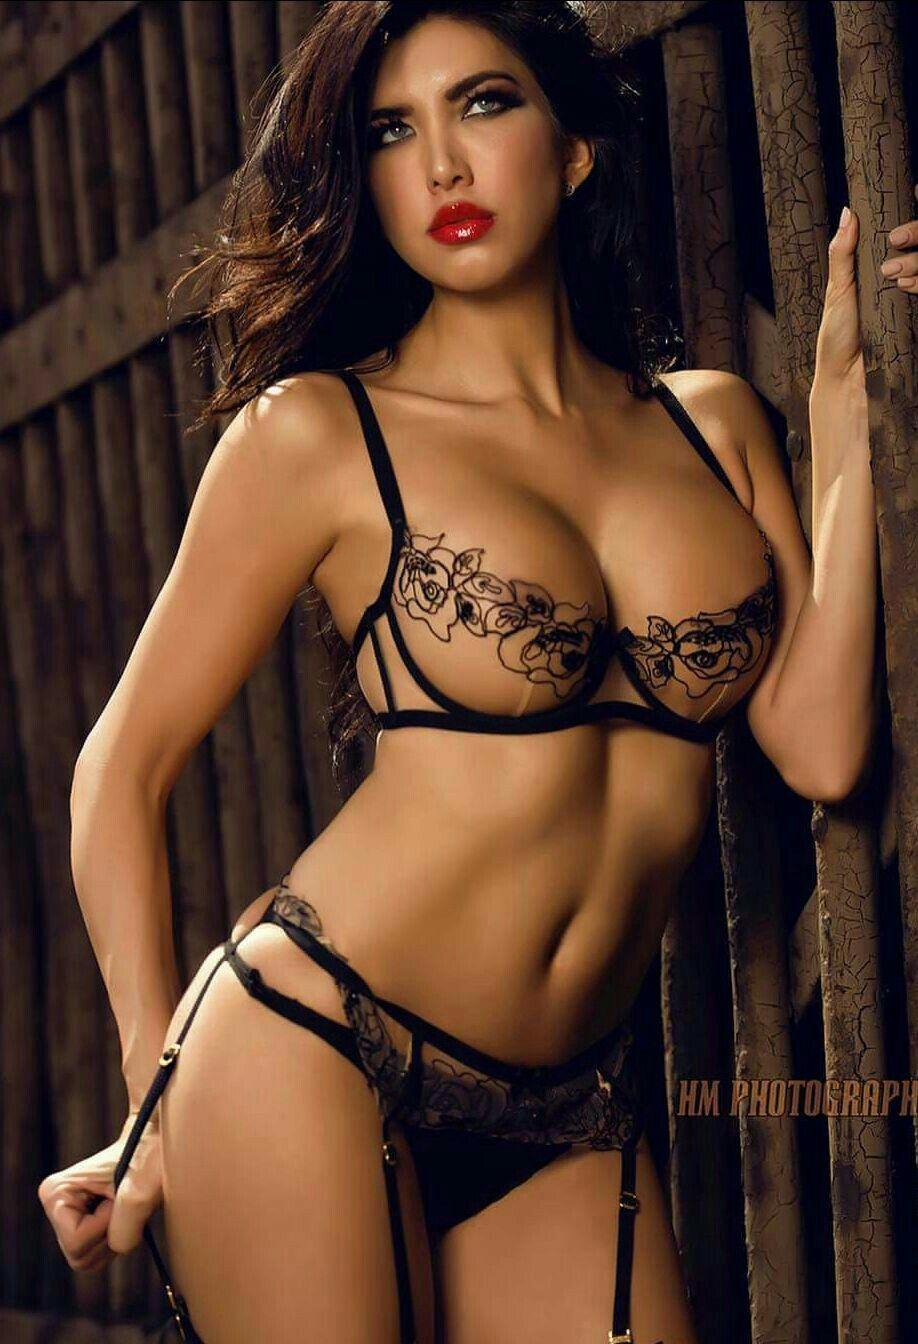 Ayesha babe big black boob enjoy love sexy